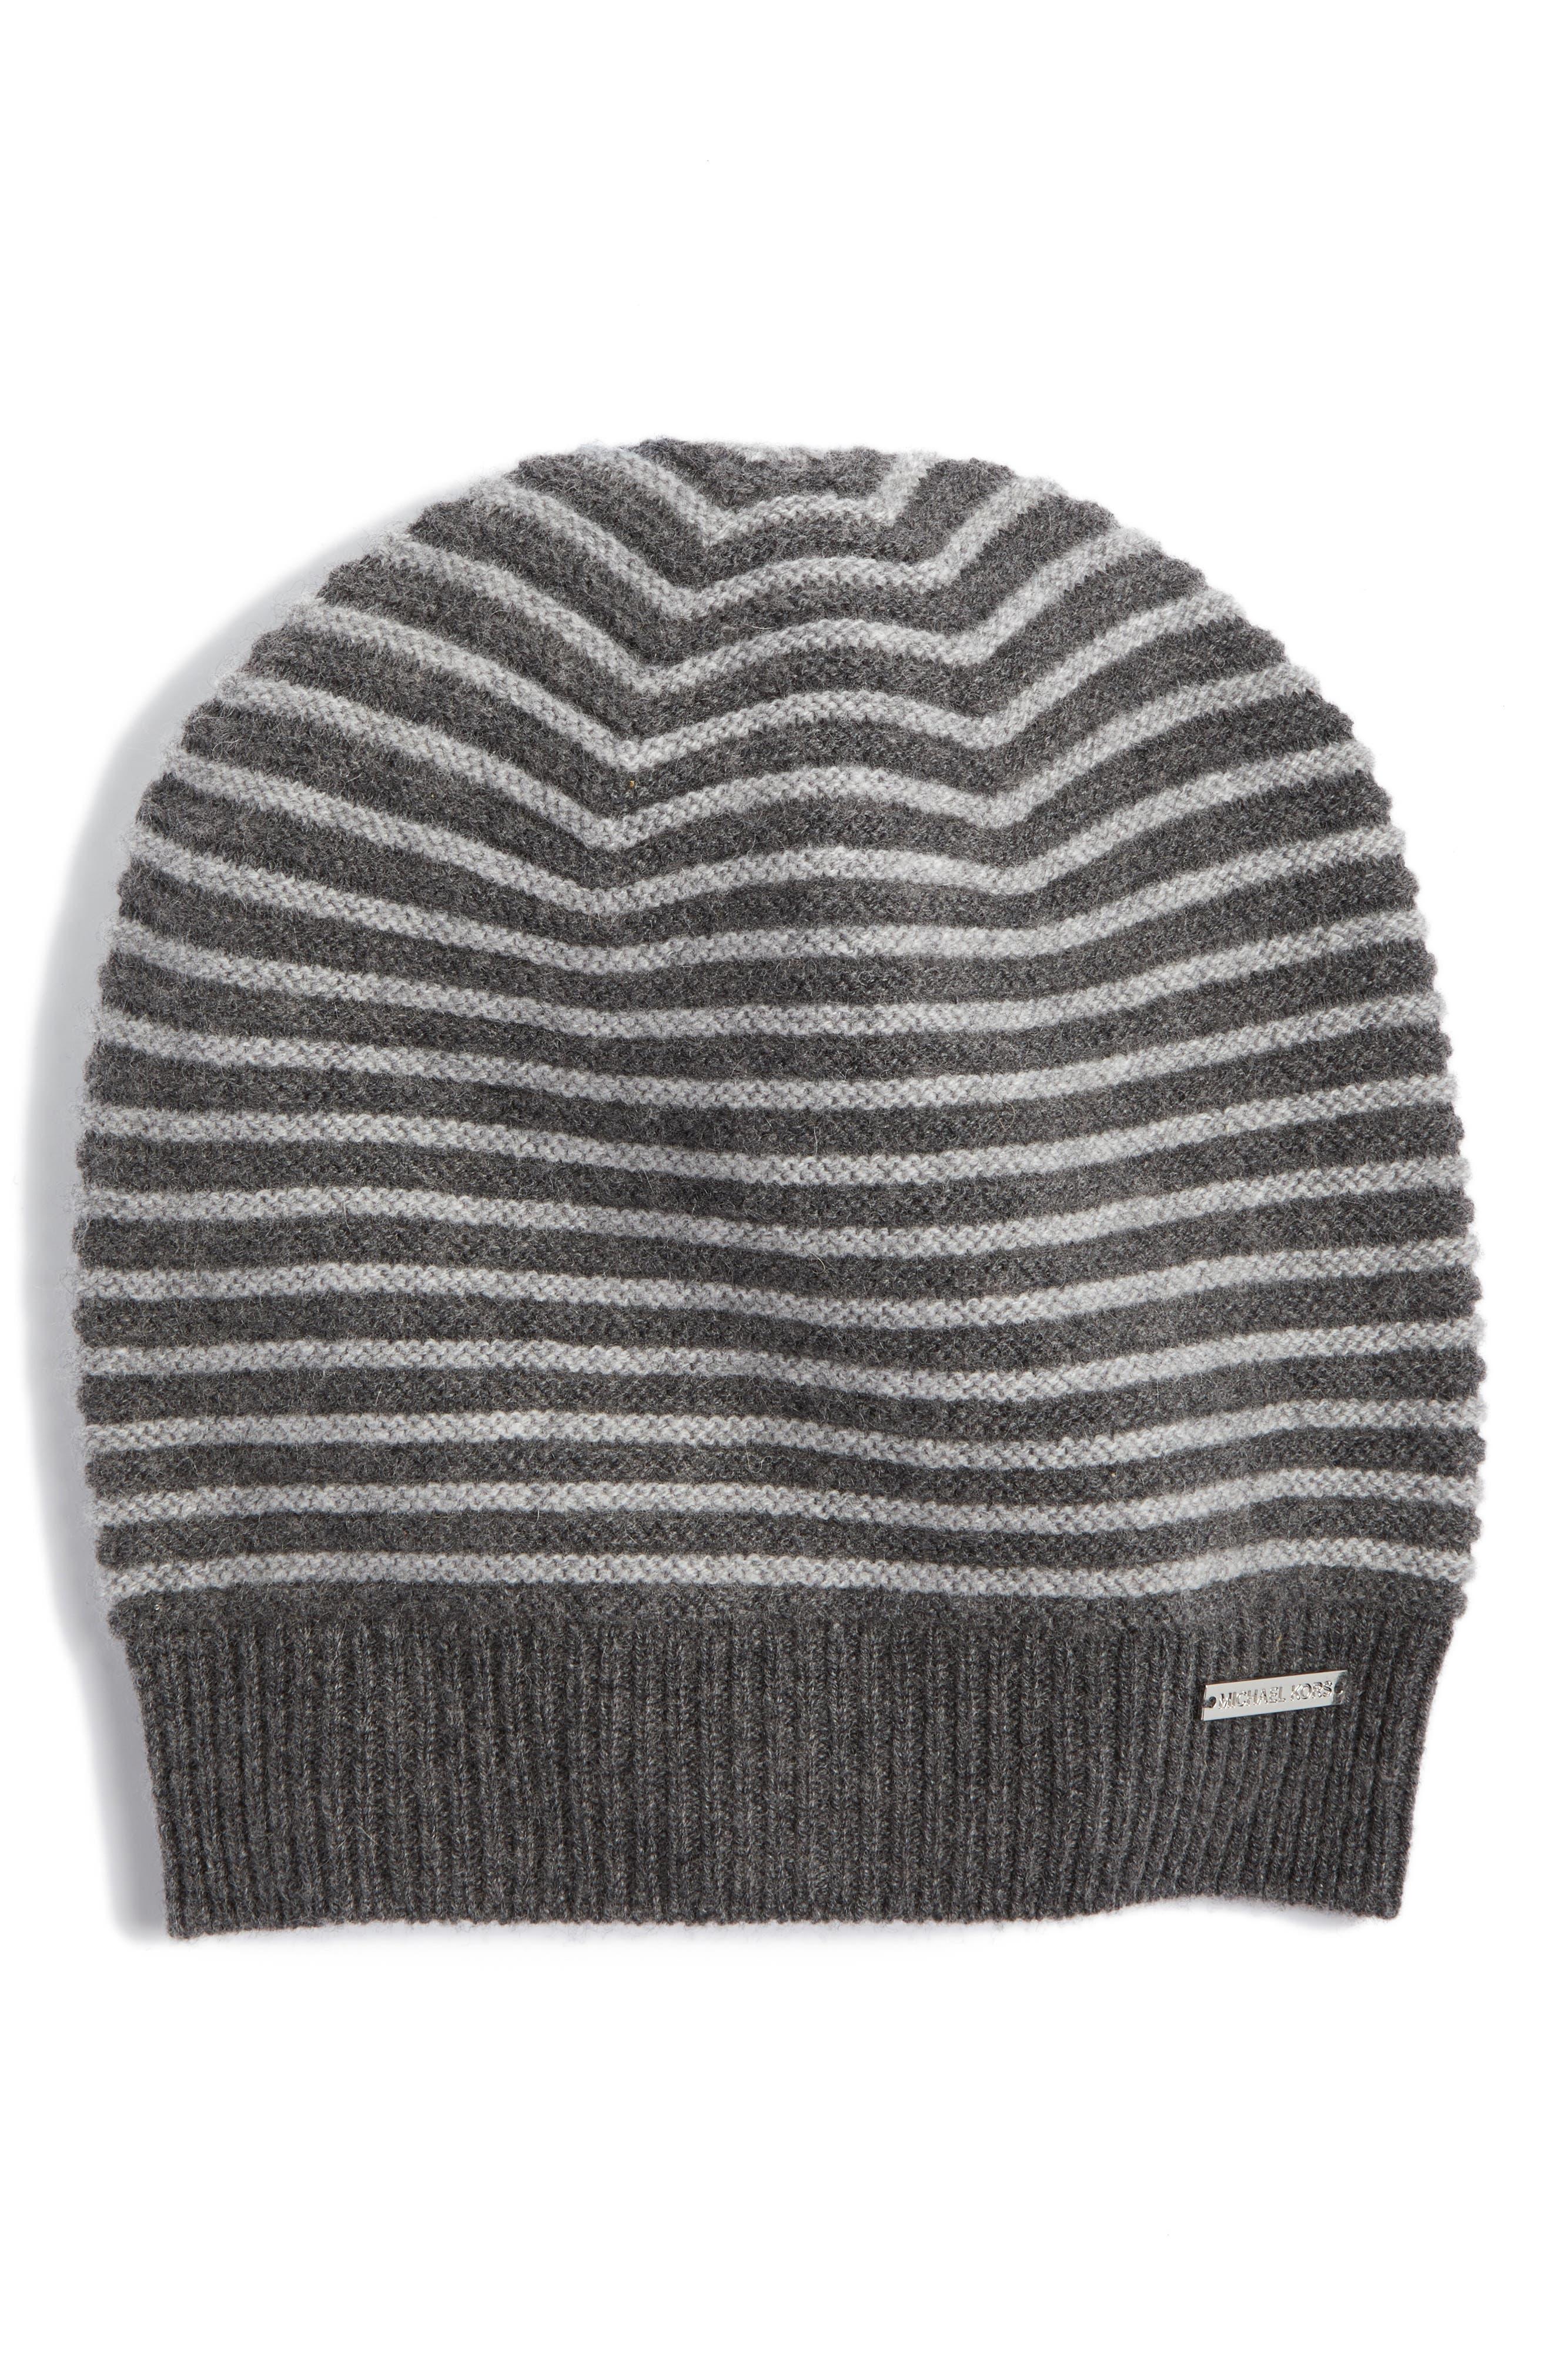 MICHAEL Michael Kors Double Links Wool & Cashmere Hat